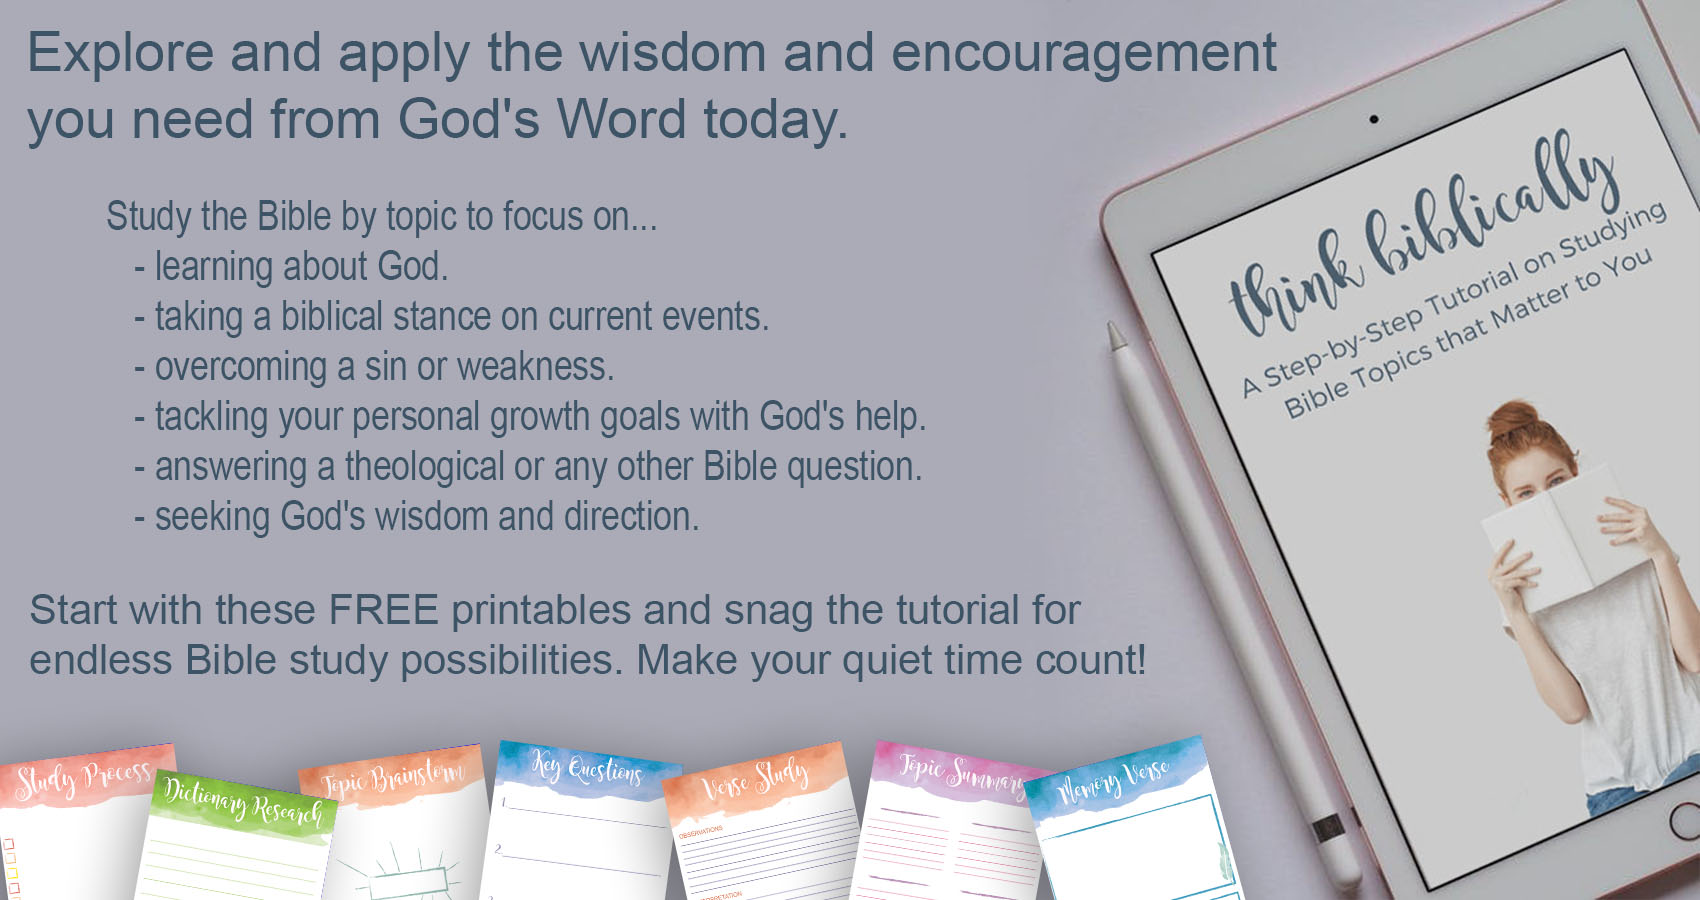 free-bible-study-printables